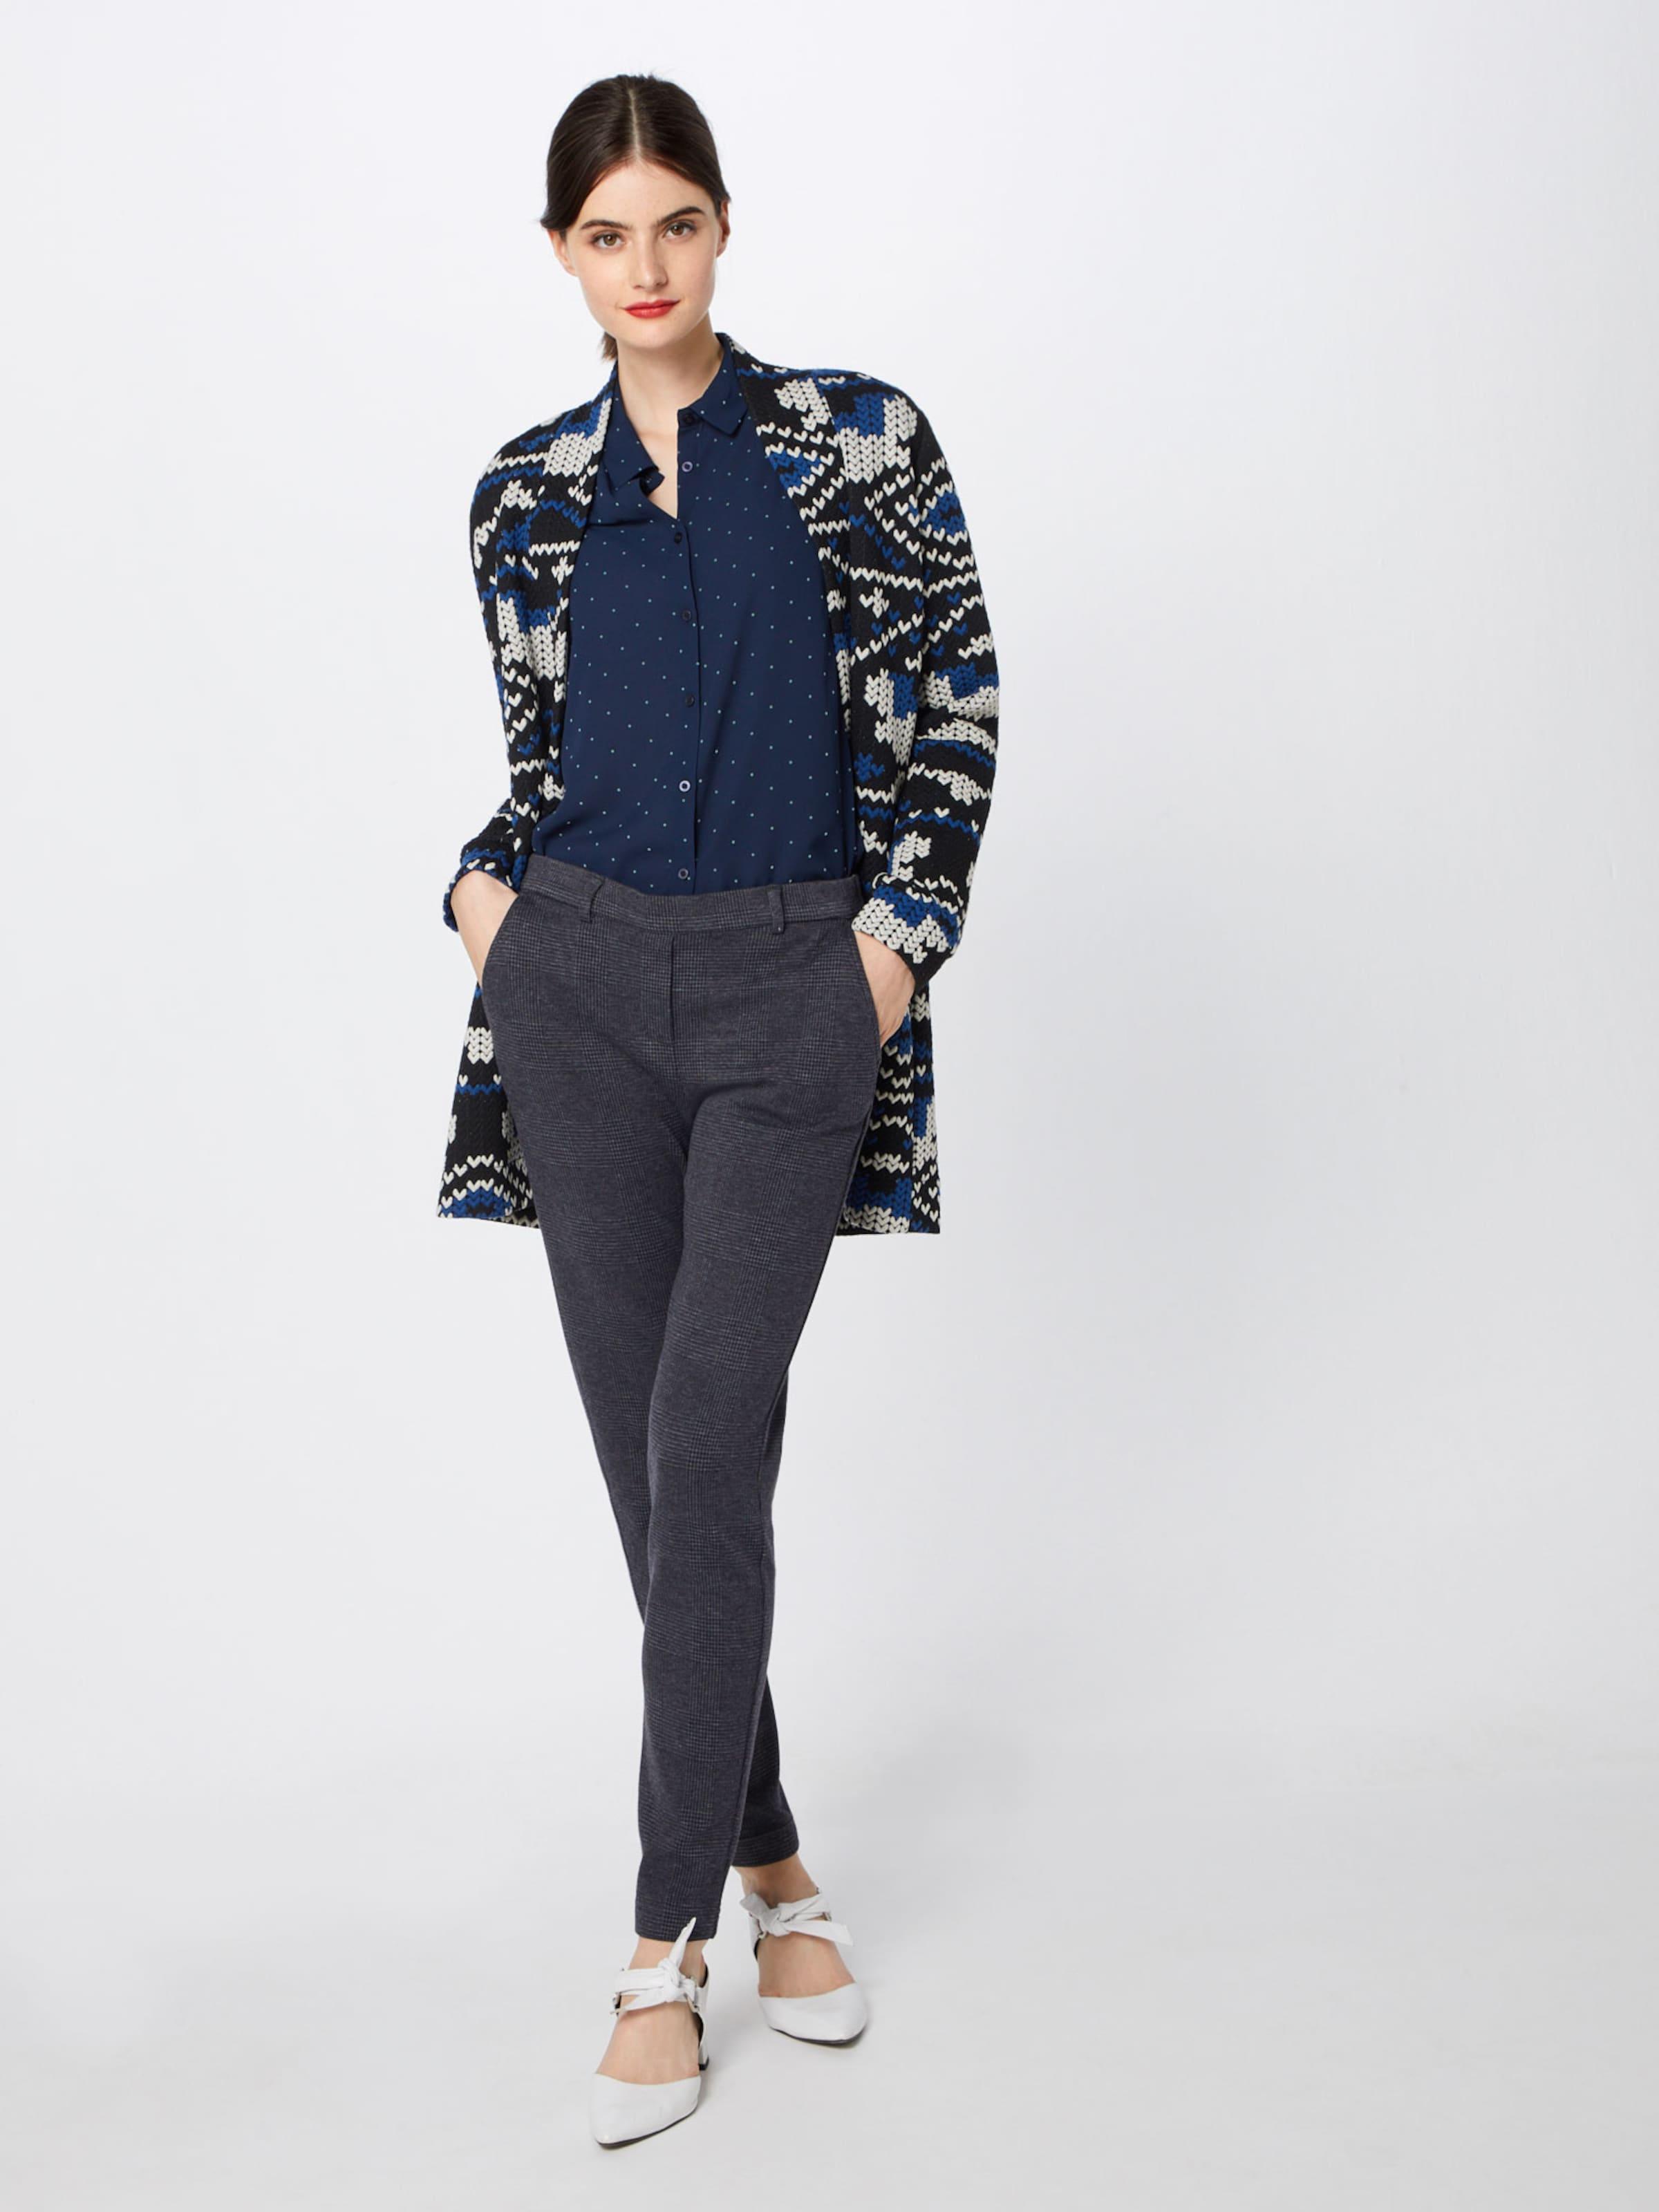 Pantalon En MarineGris Esprit Chiné Bleu USVMzqp